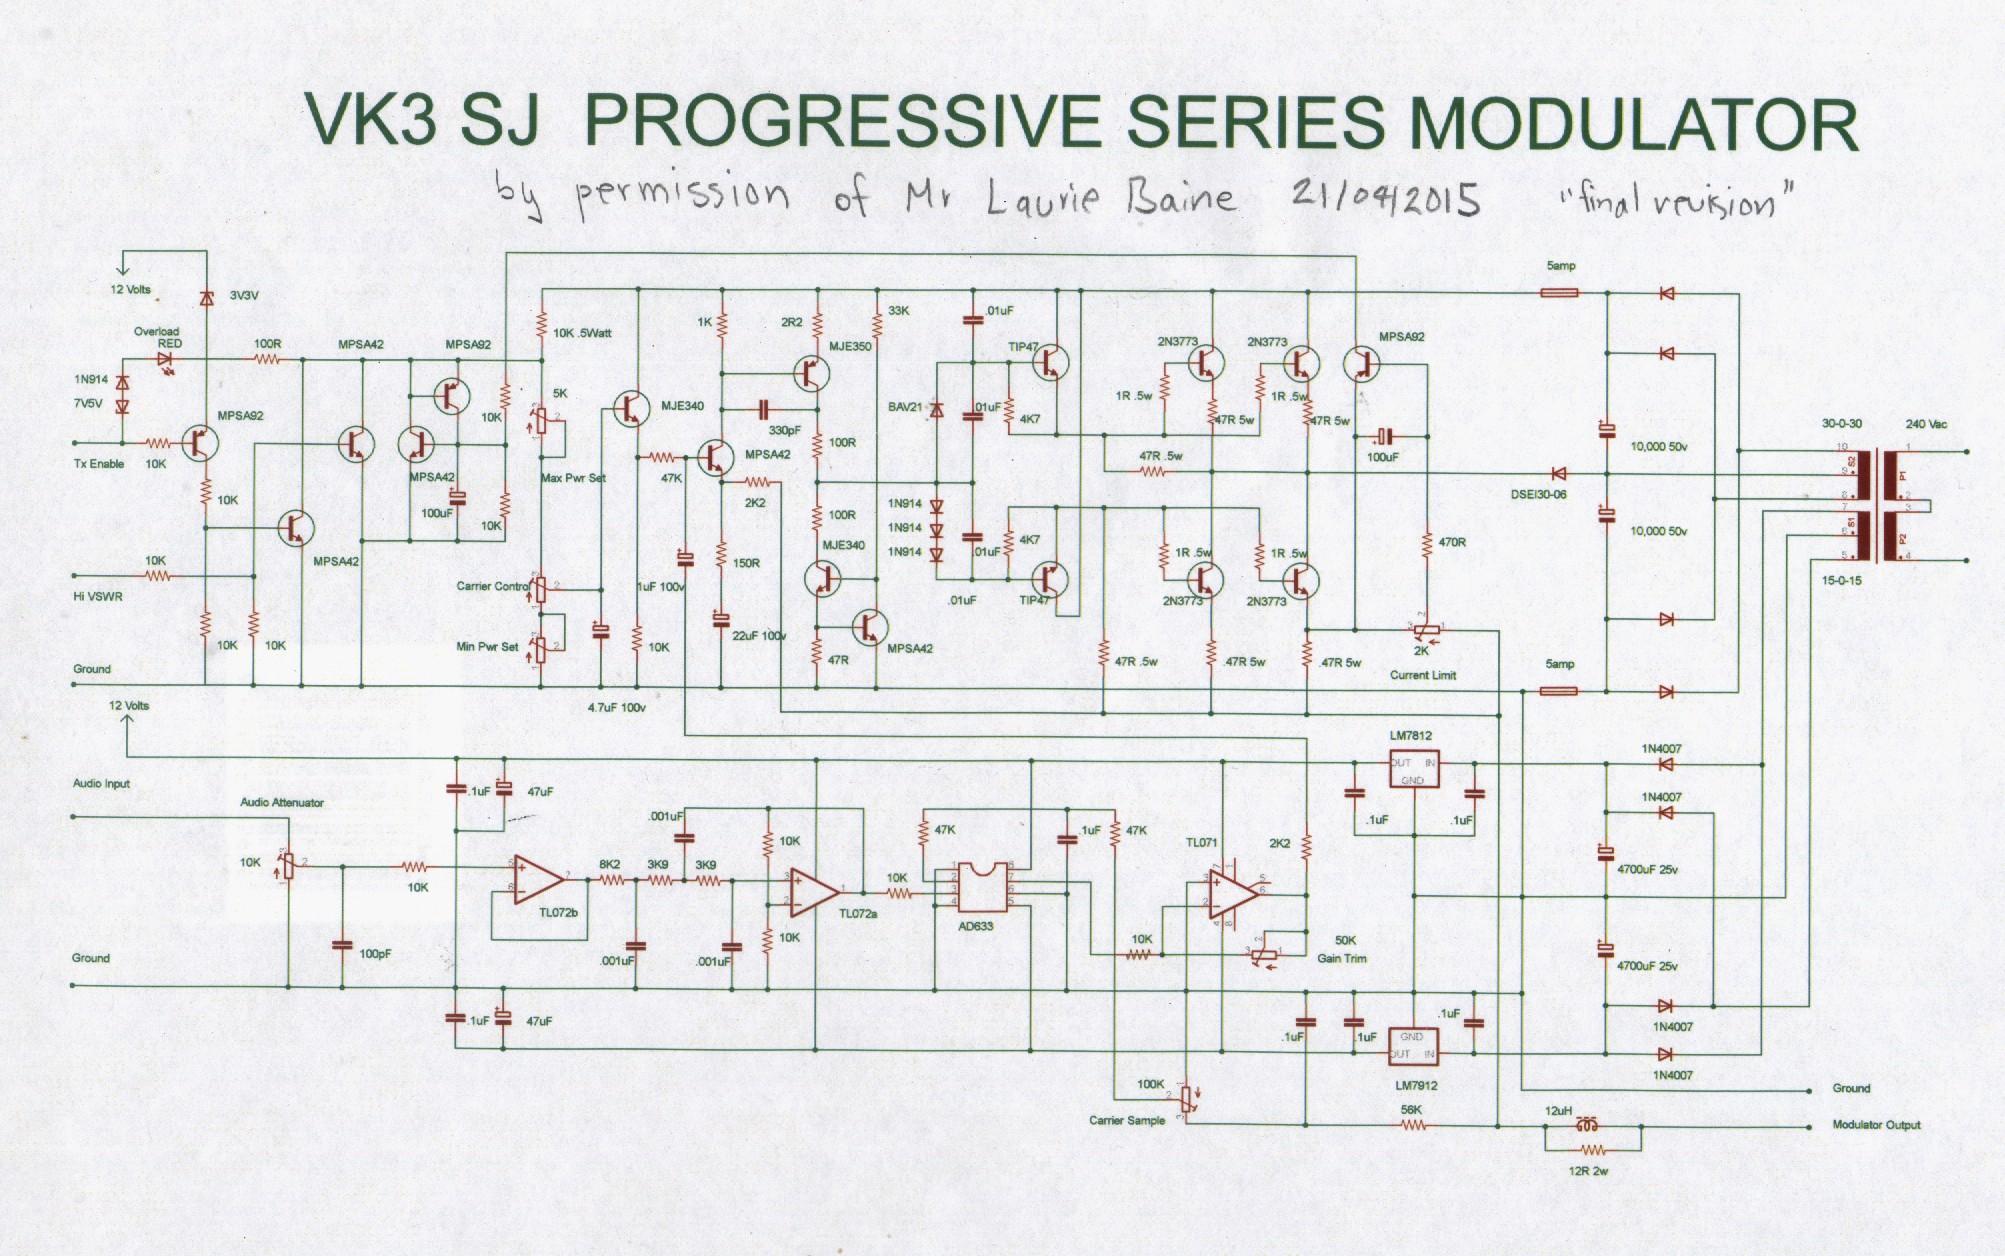 Vk3sj Am Transmitter Circuit Diagram Thumbmodulator Progressive Final 21 Apr 2015